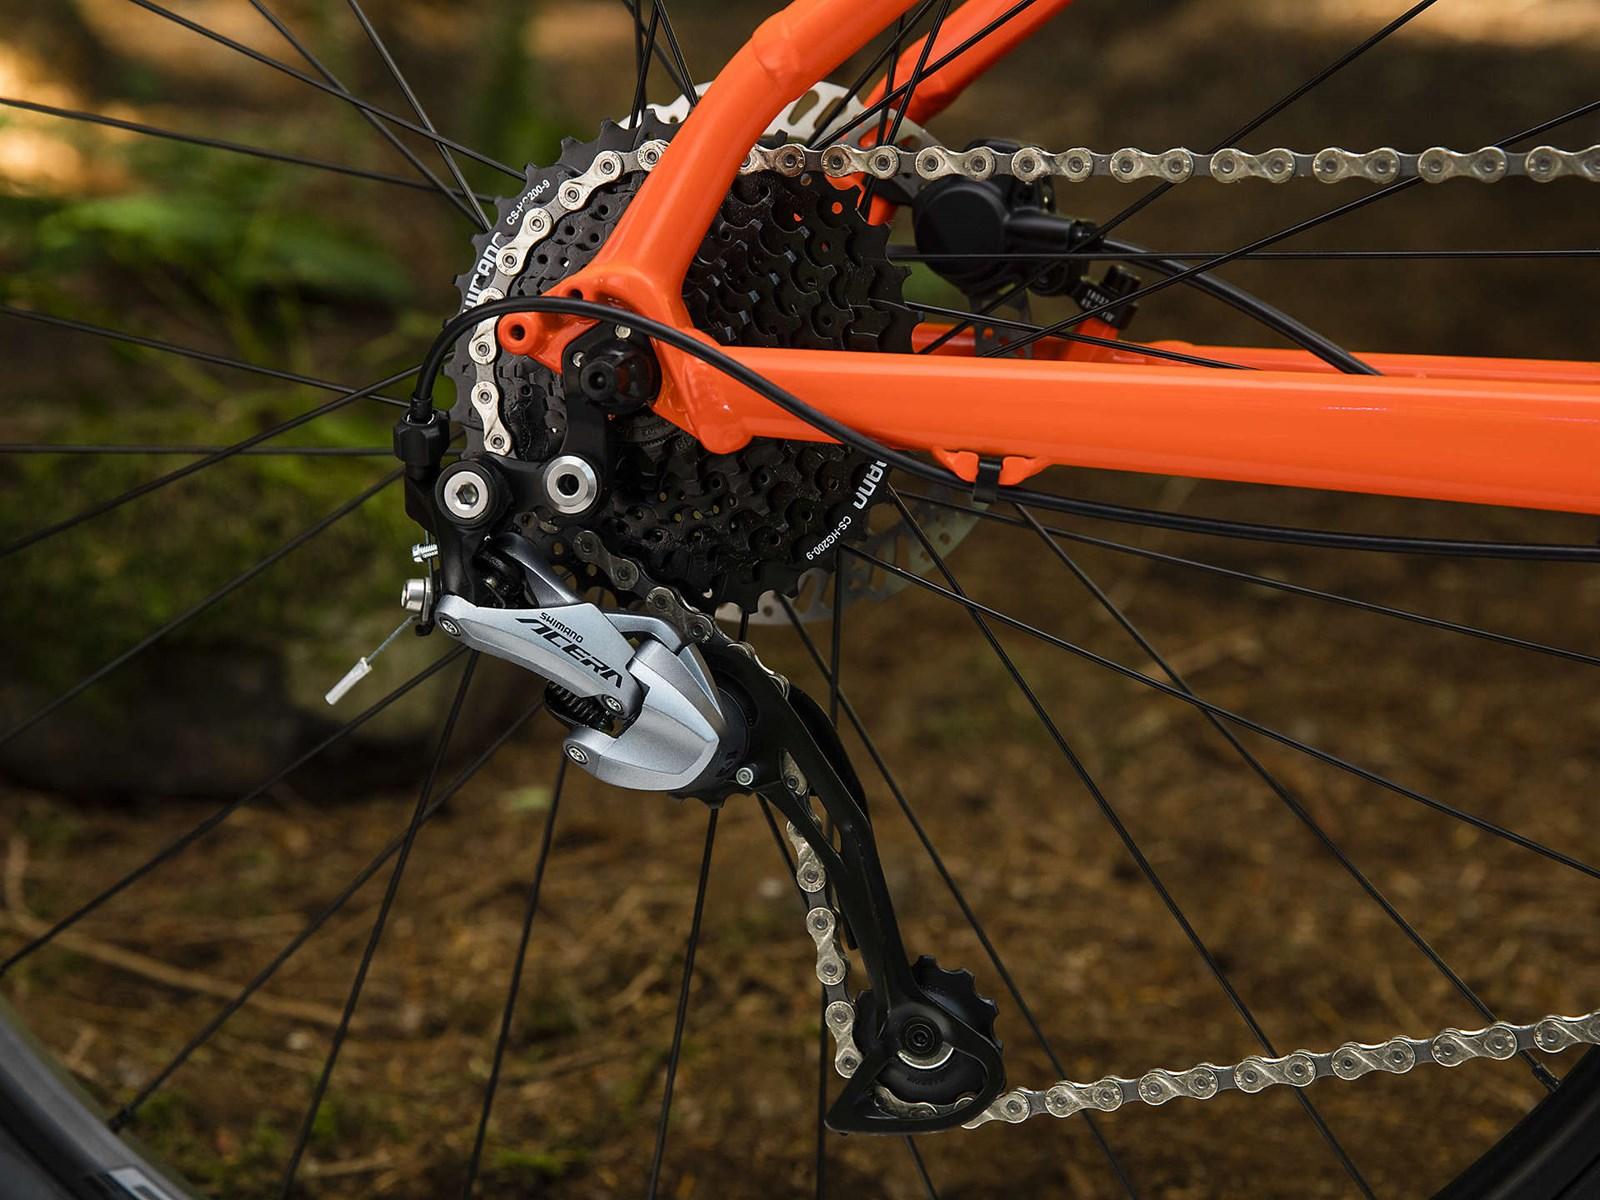 a73418e13 rek Marlin 7 2019 Hardtail Mountain Bike - Orange £550.00